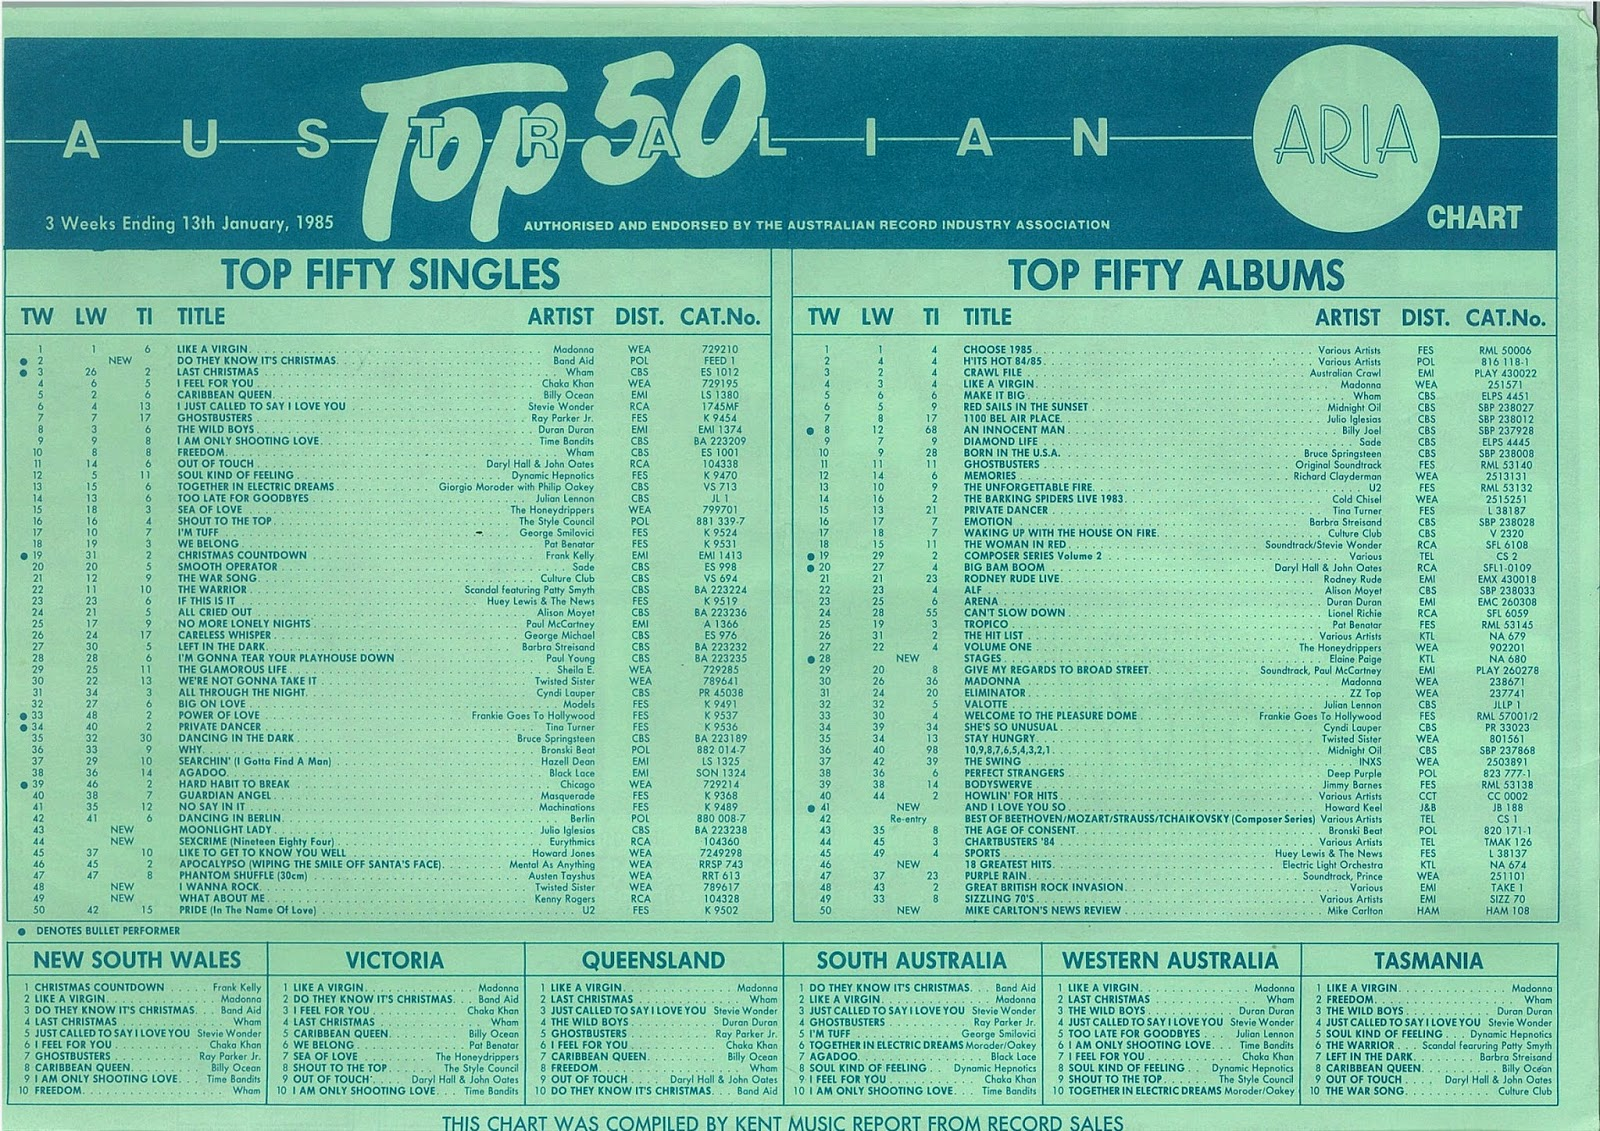 Top 200 Albums | Billboard 200 chart | Billboard